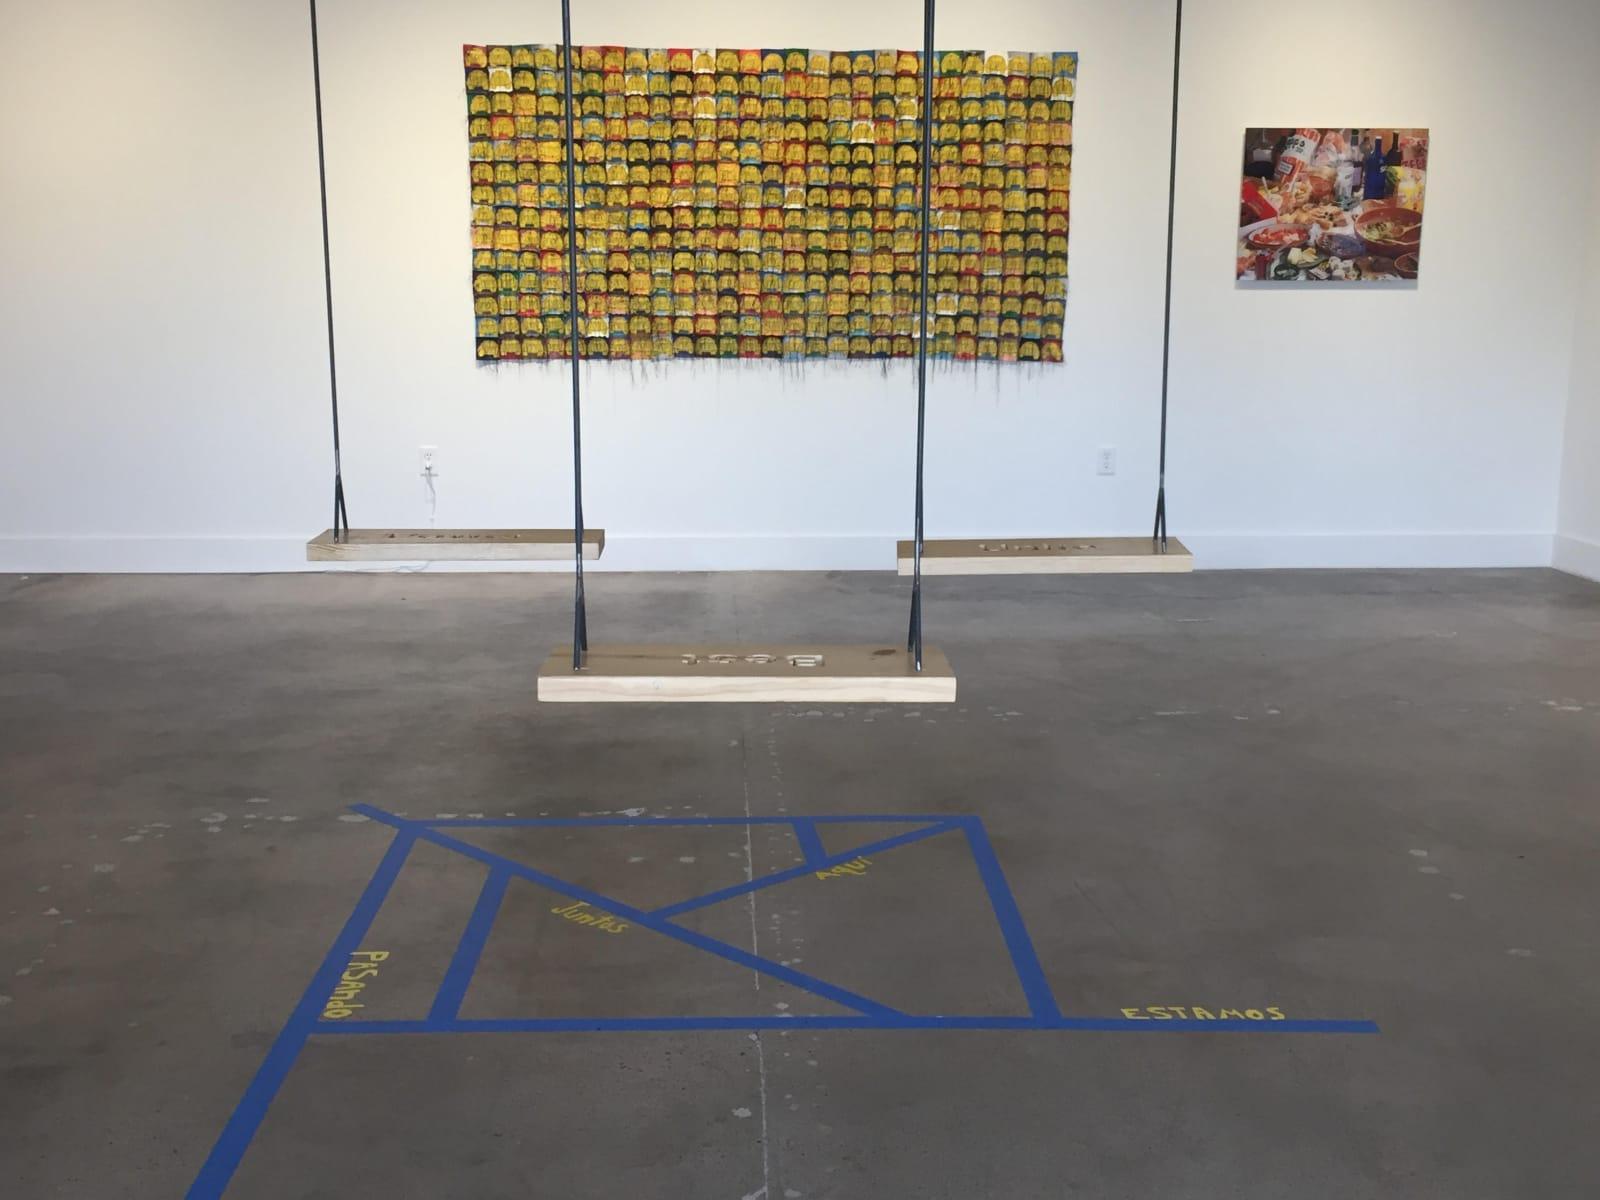 Latinx Art: Transcending Borders